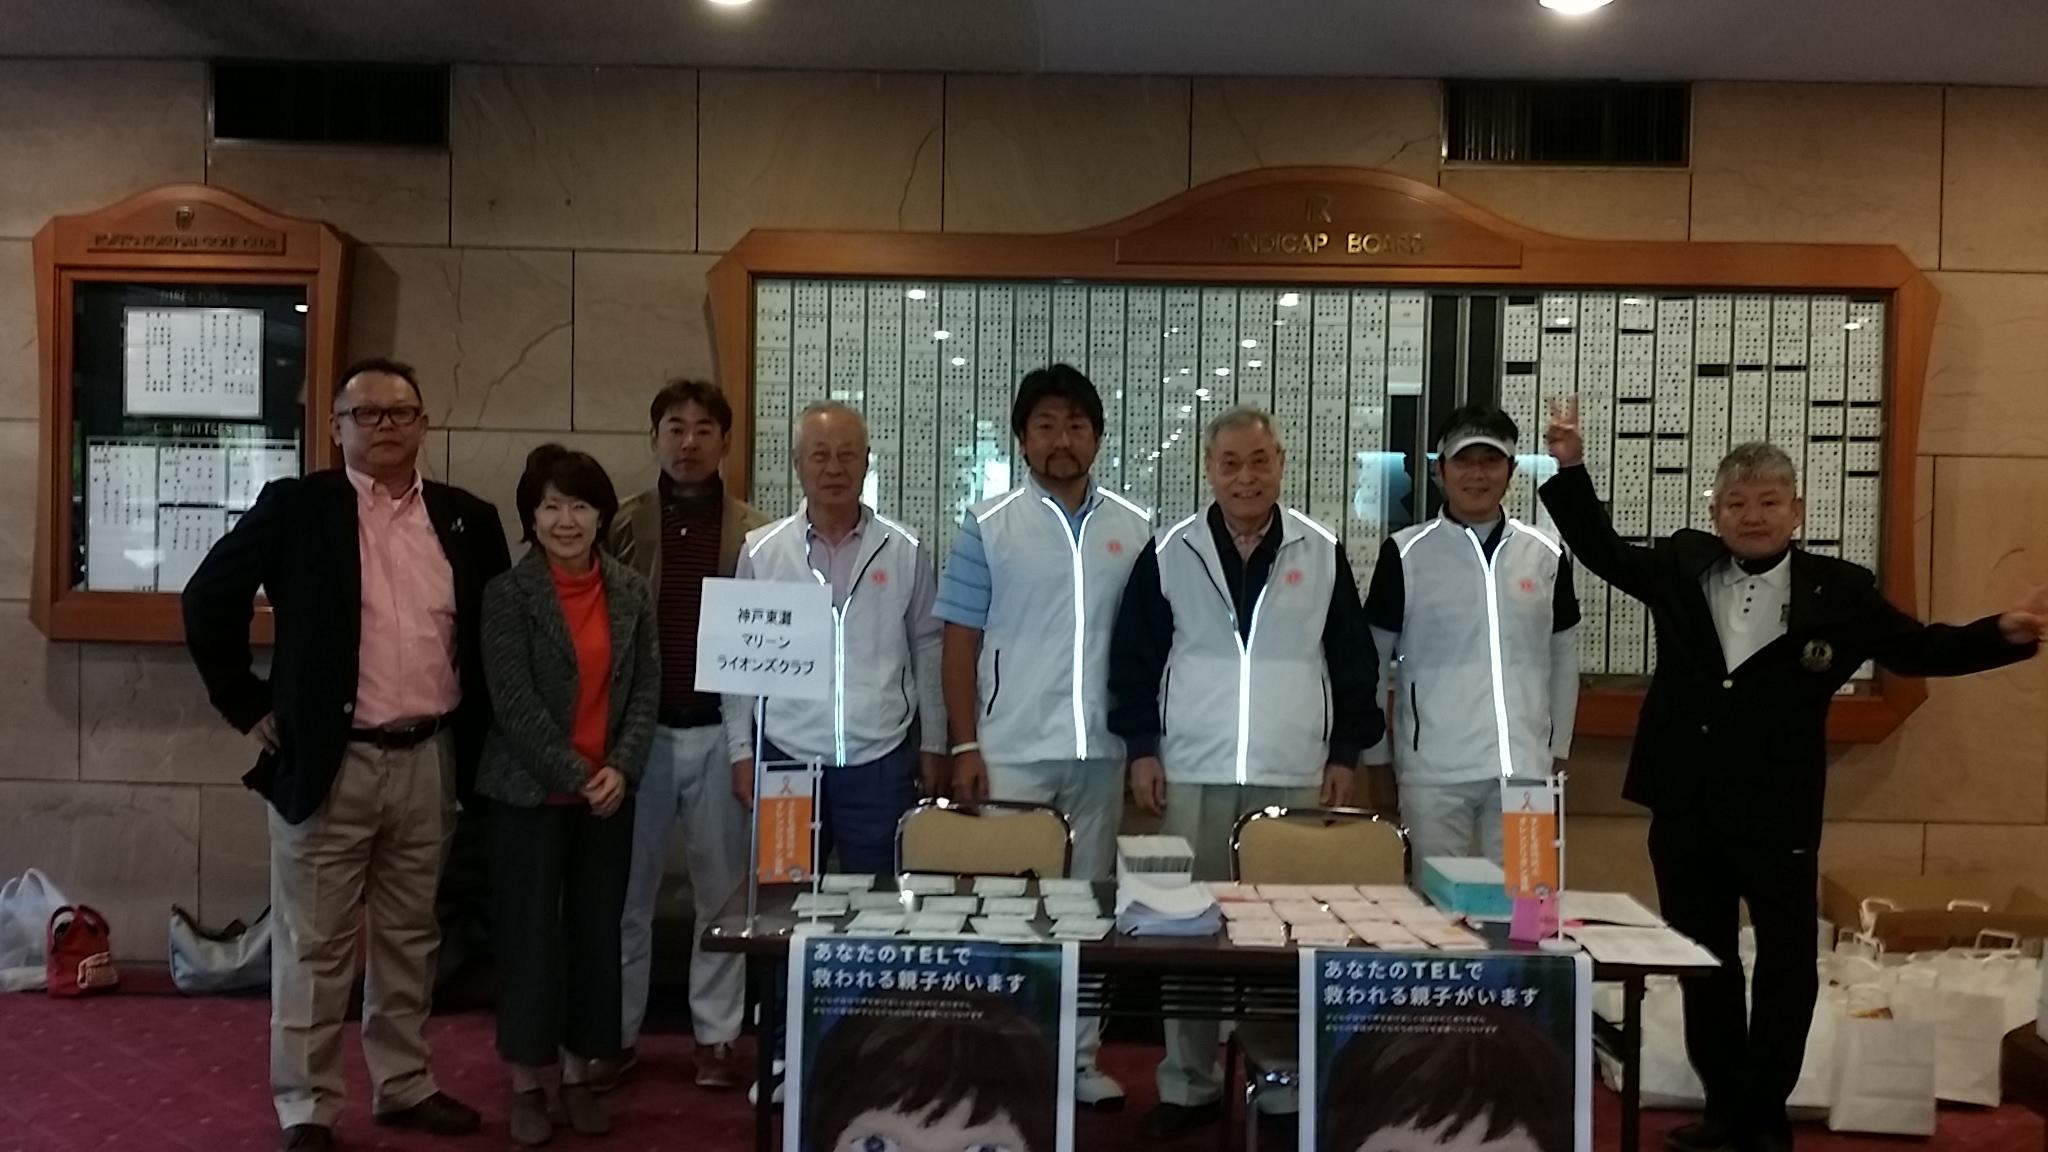 http://www.orangeribbon.jp/info/organization/images/20161031_074203.jpg